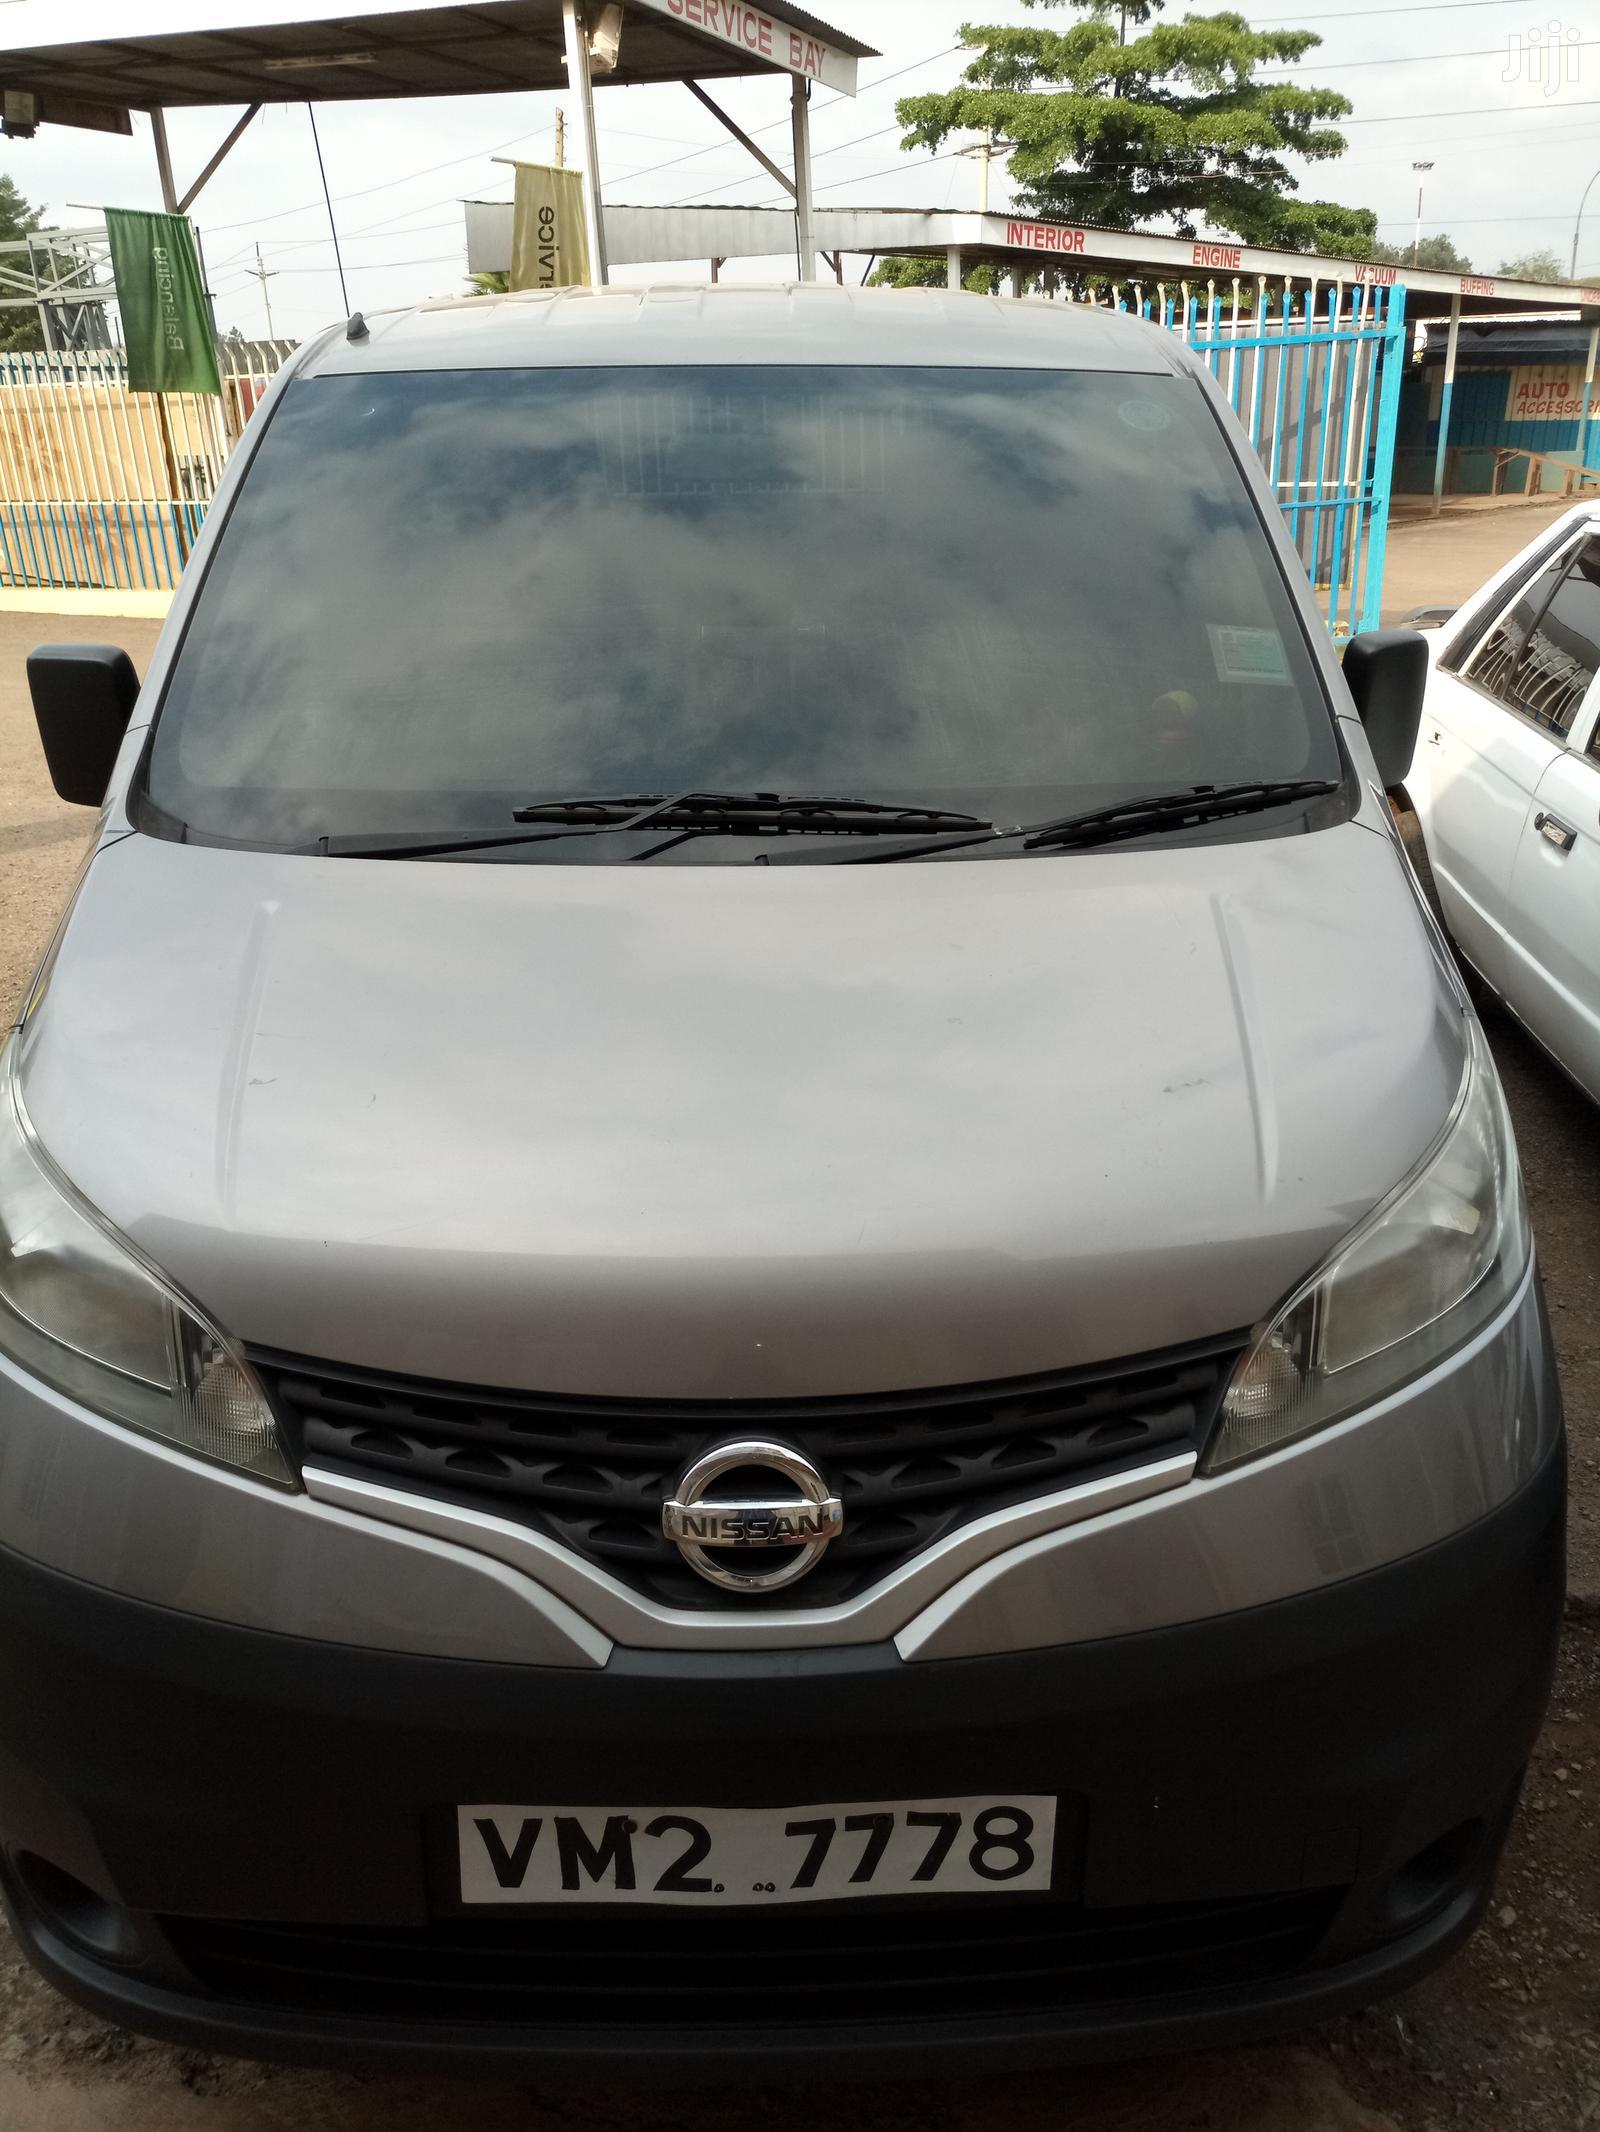 Presidential Dark Llumar Car Tints In Nairobi West Vehicle Parts Accessories Heatgard Pro Tinting Jiji Co Ke